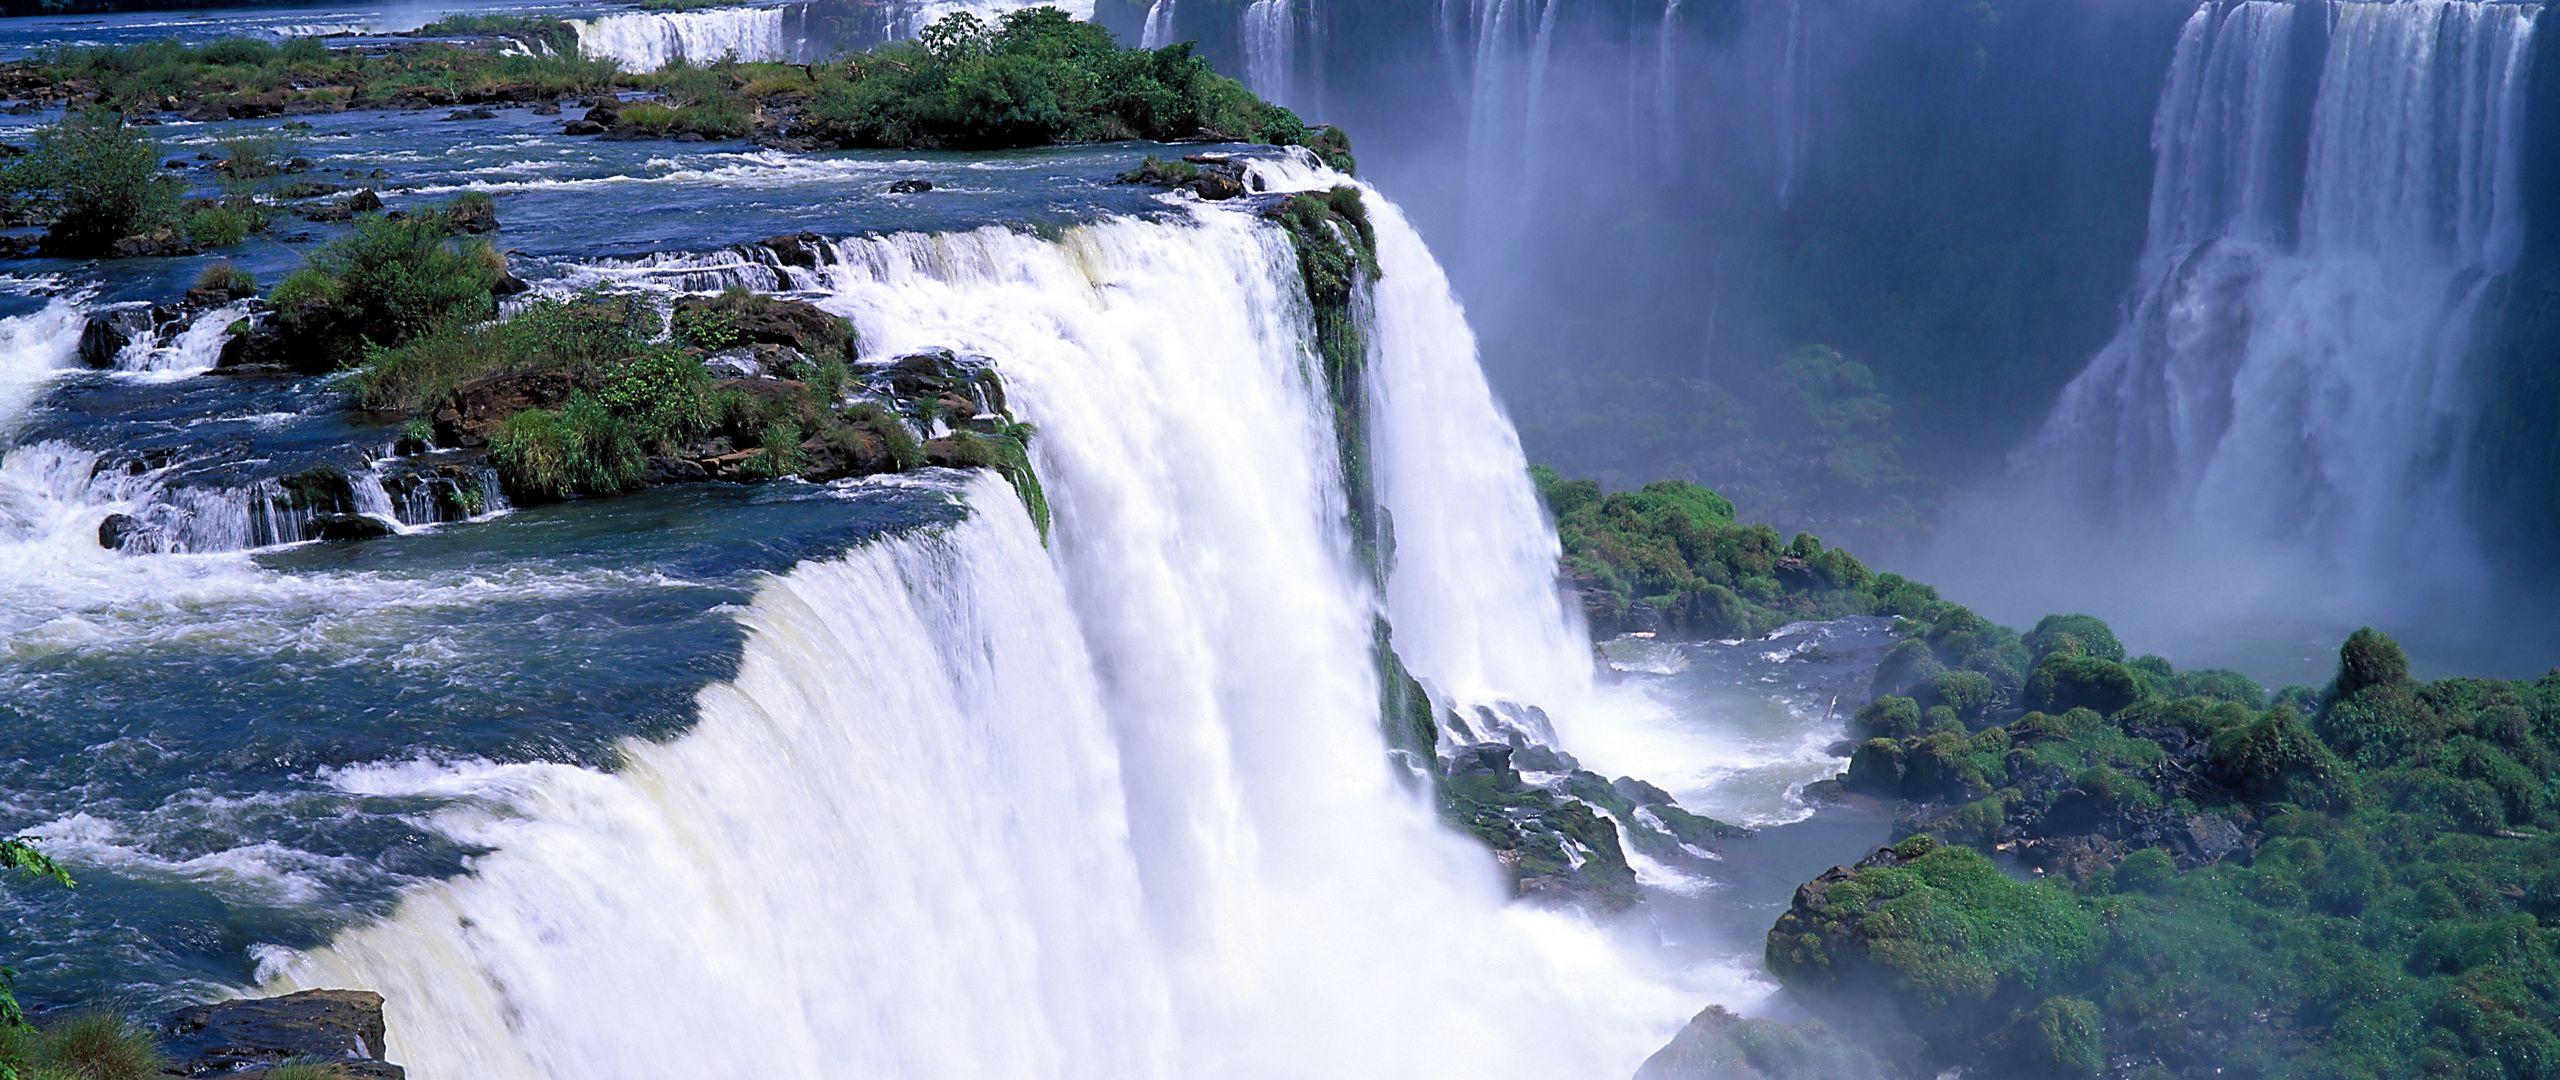 2560x1080 Wallpaper falls, rocks, trees, steam, stream, force, power